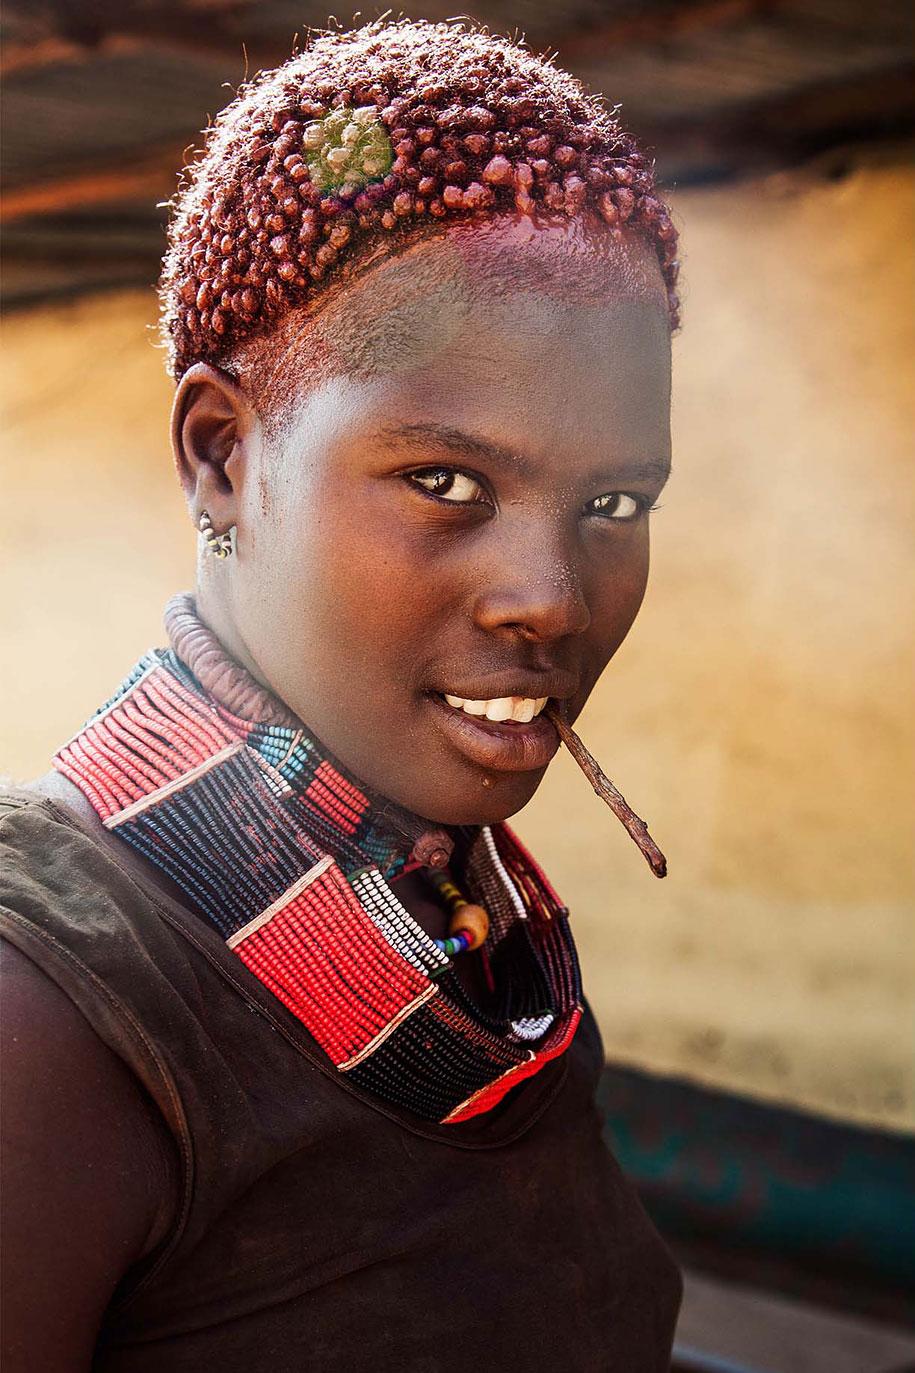 women-around-world-atlas-beauty-mihaela-noroc-3